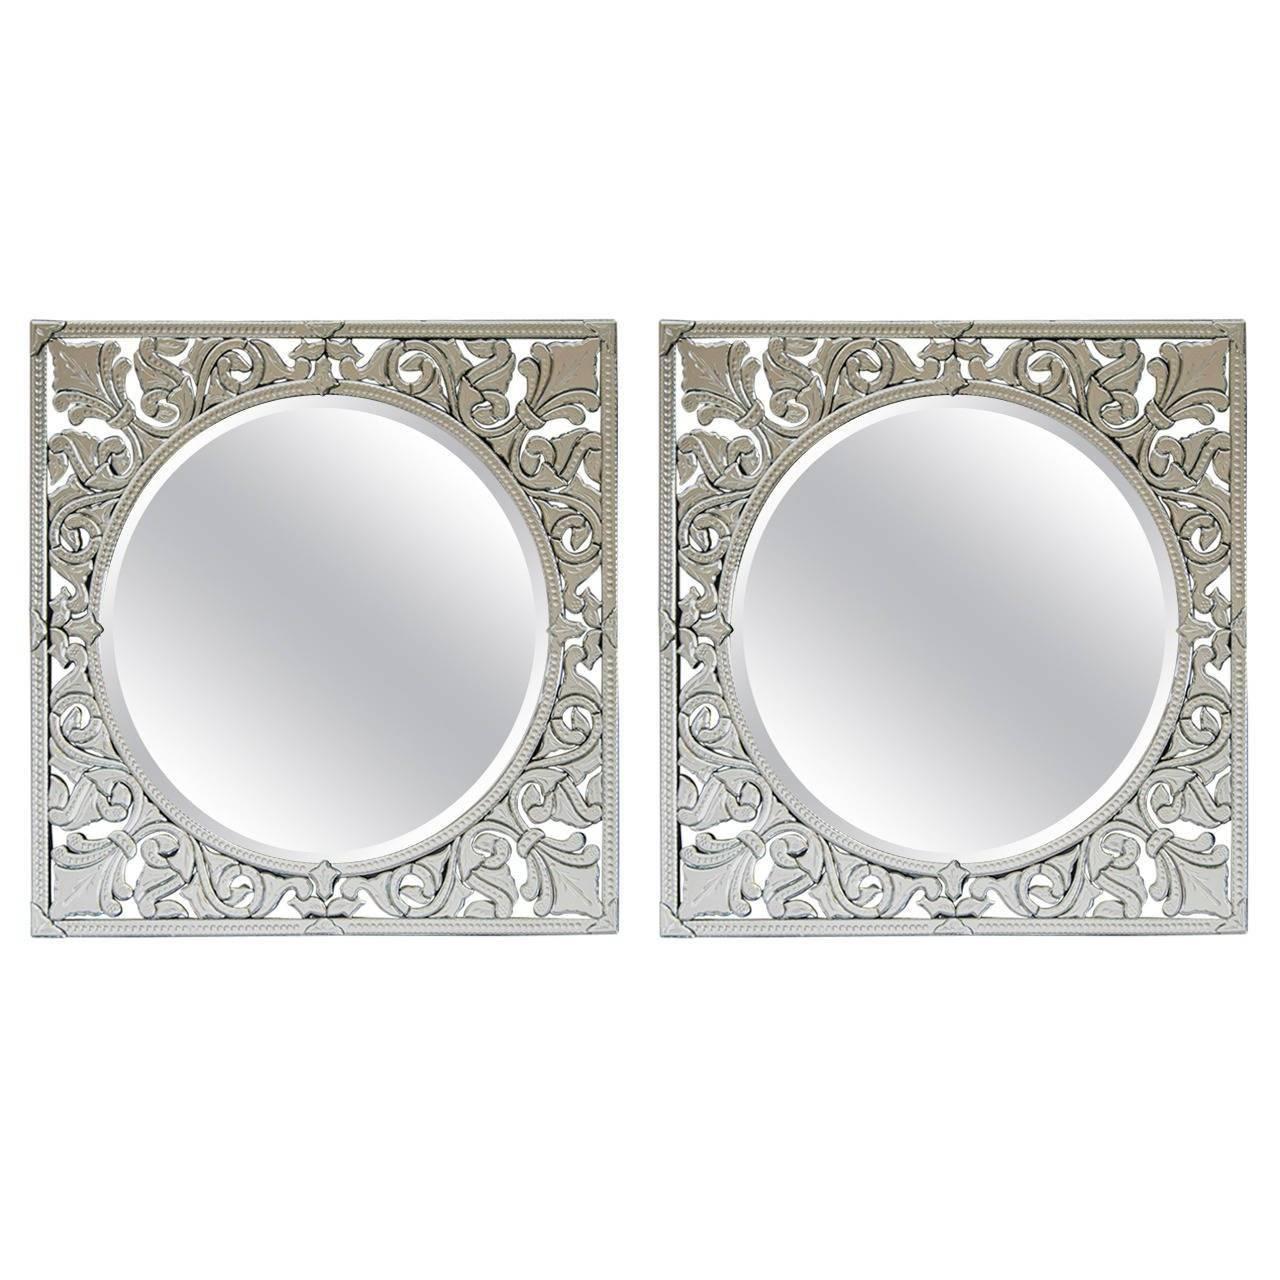 Pair Of Square Venetian Mirrors, Italy At 1Stdibs throughout Square Venetian Mirrors (Image 20 of 25)